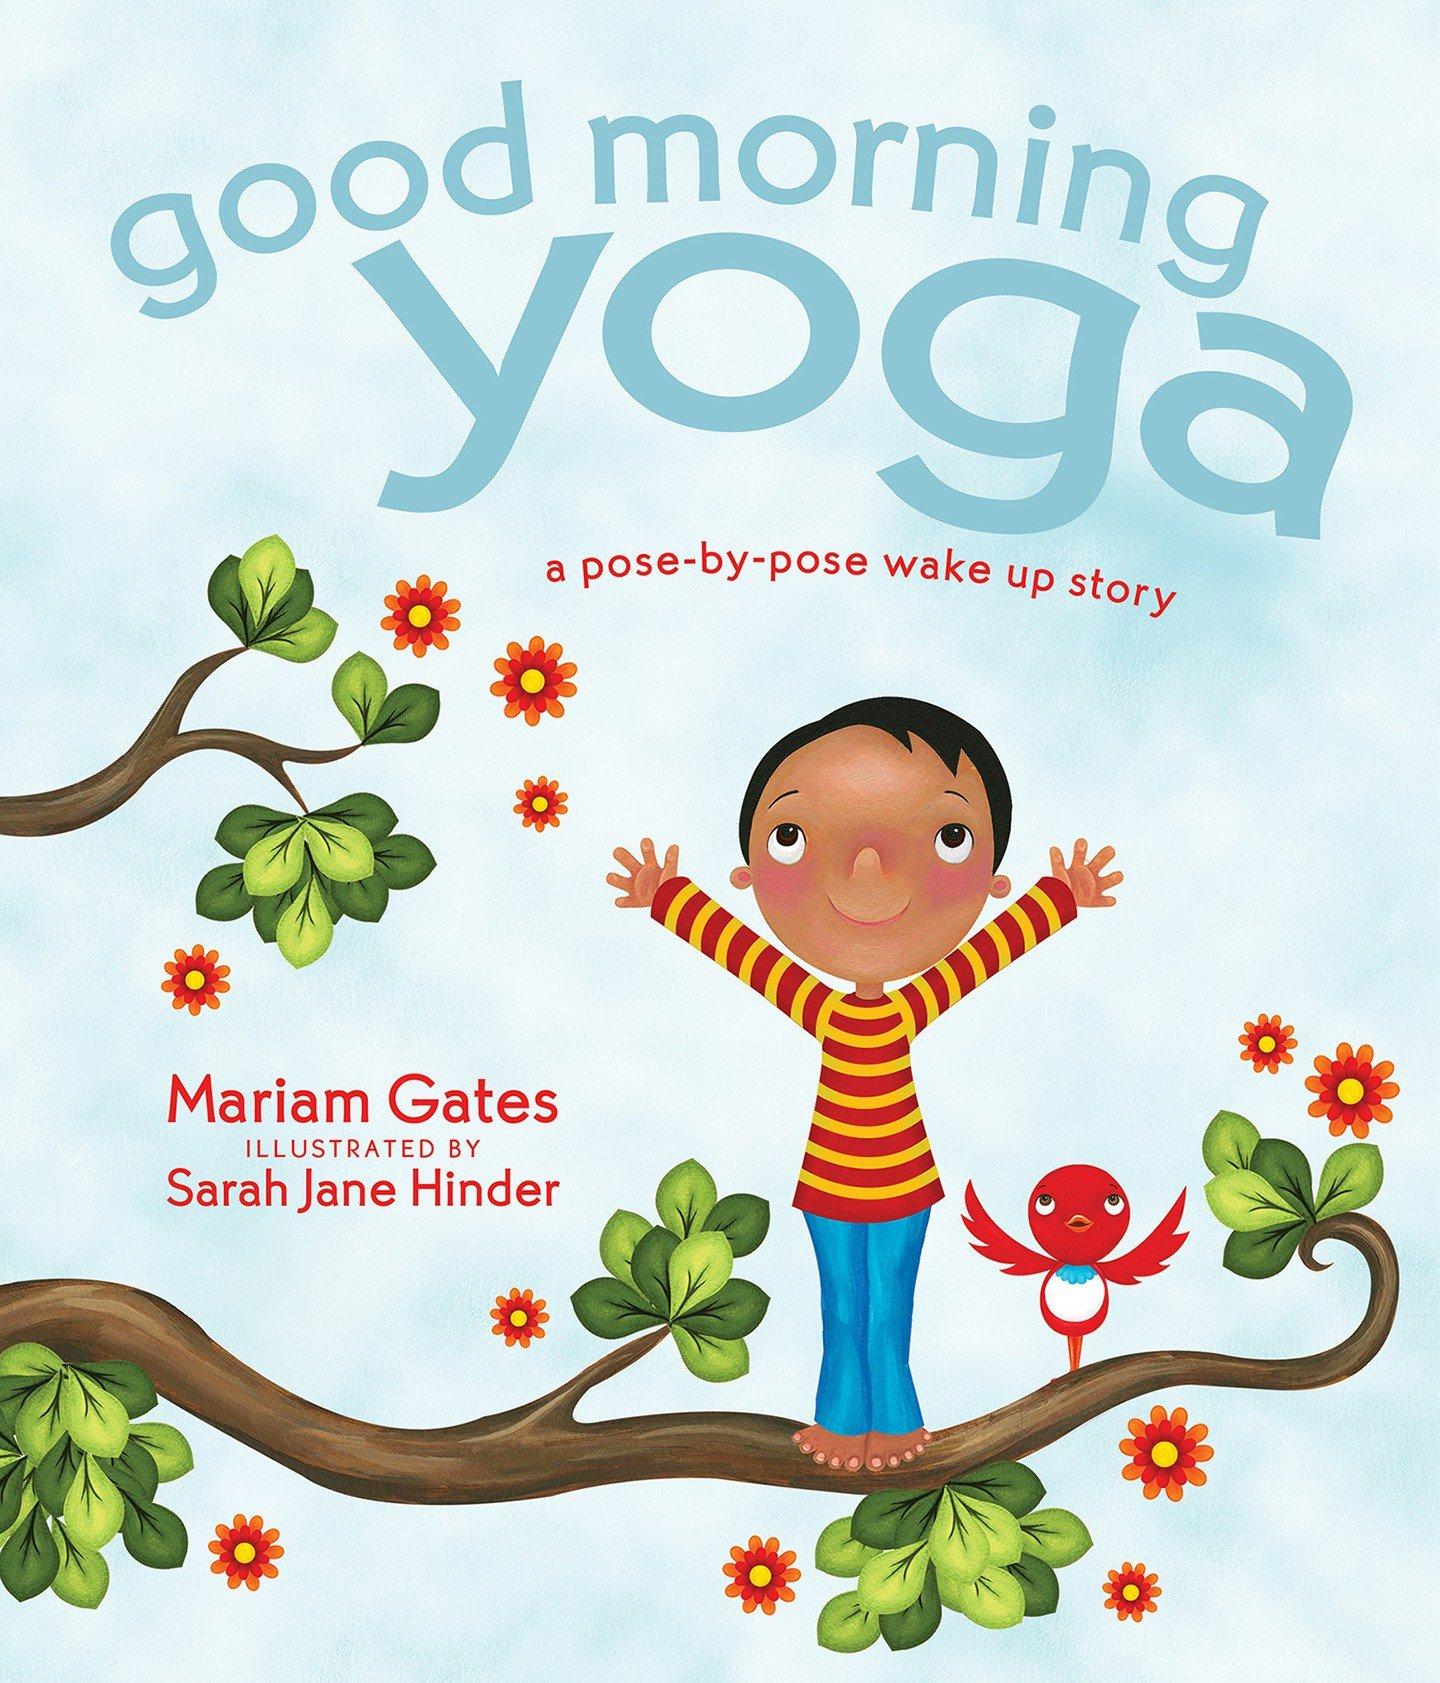 Amazon.com: Good Morning Yoga: A Pose-by-Pose Wake Up Story  (0001622036026): Mariam Gates, Sarah Jane Hinder: Books